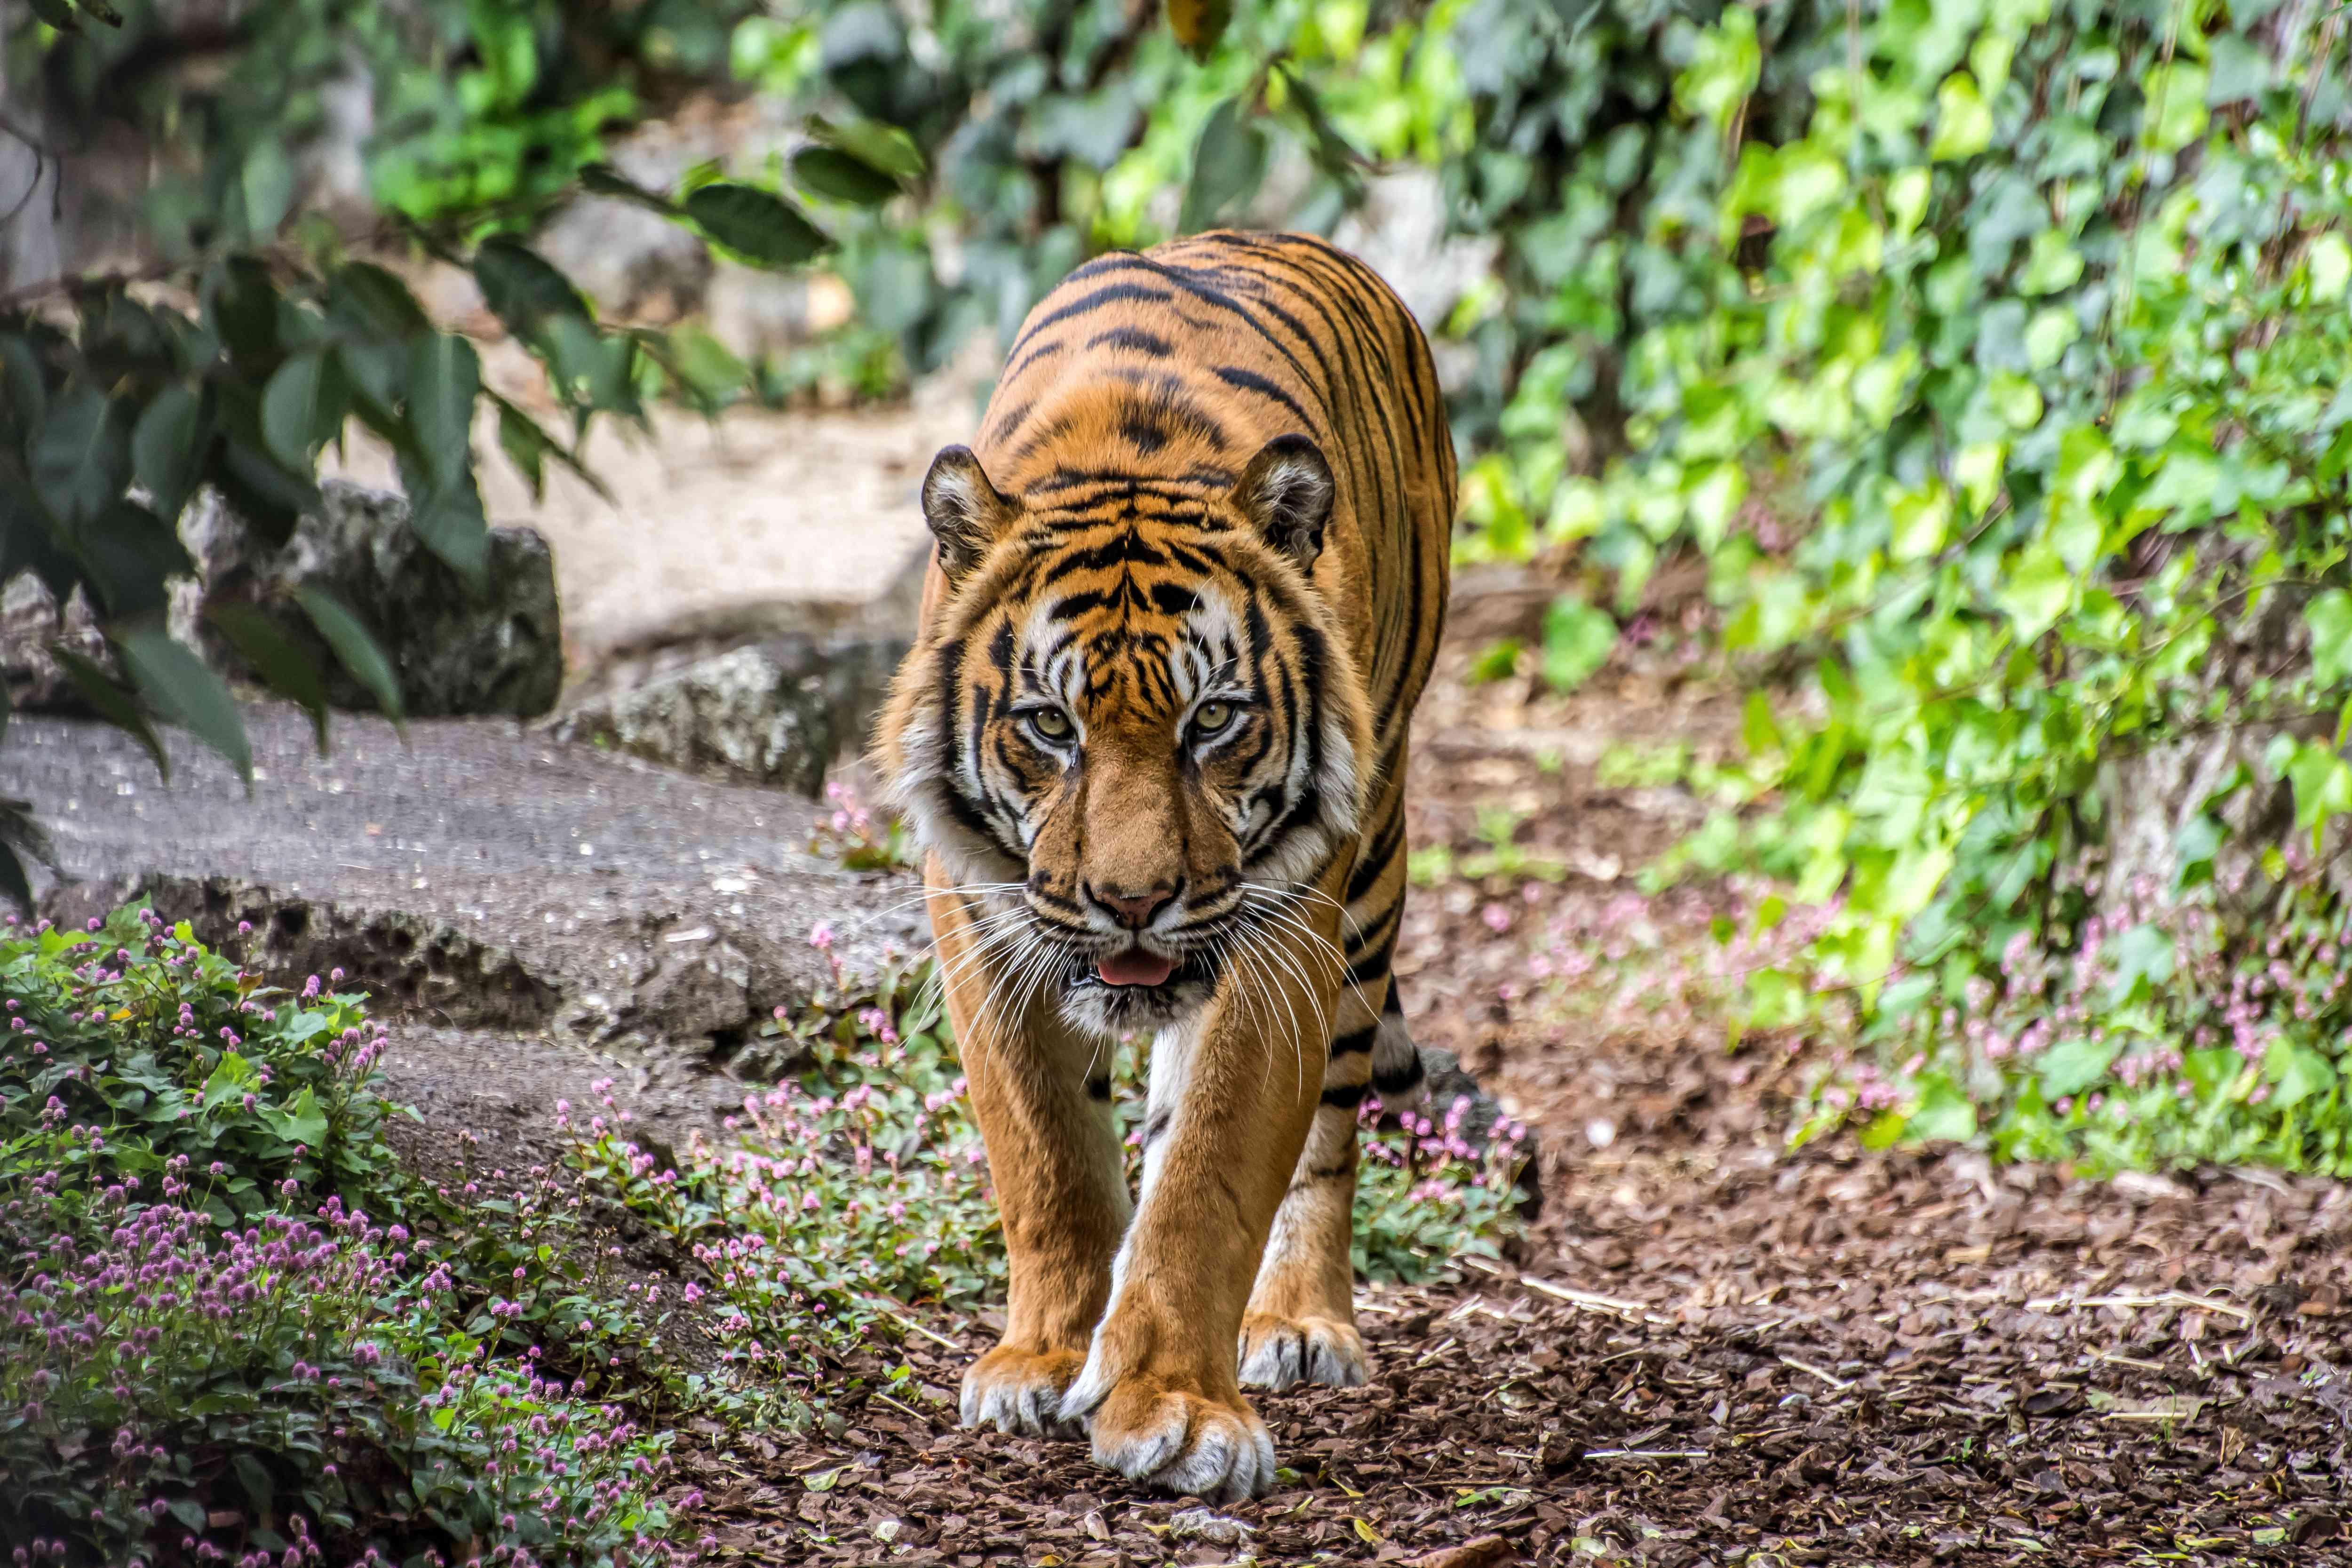 A Sumatran tiger walking a trail